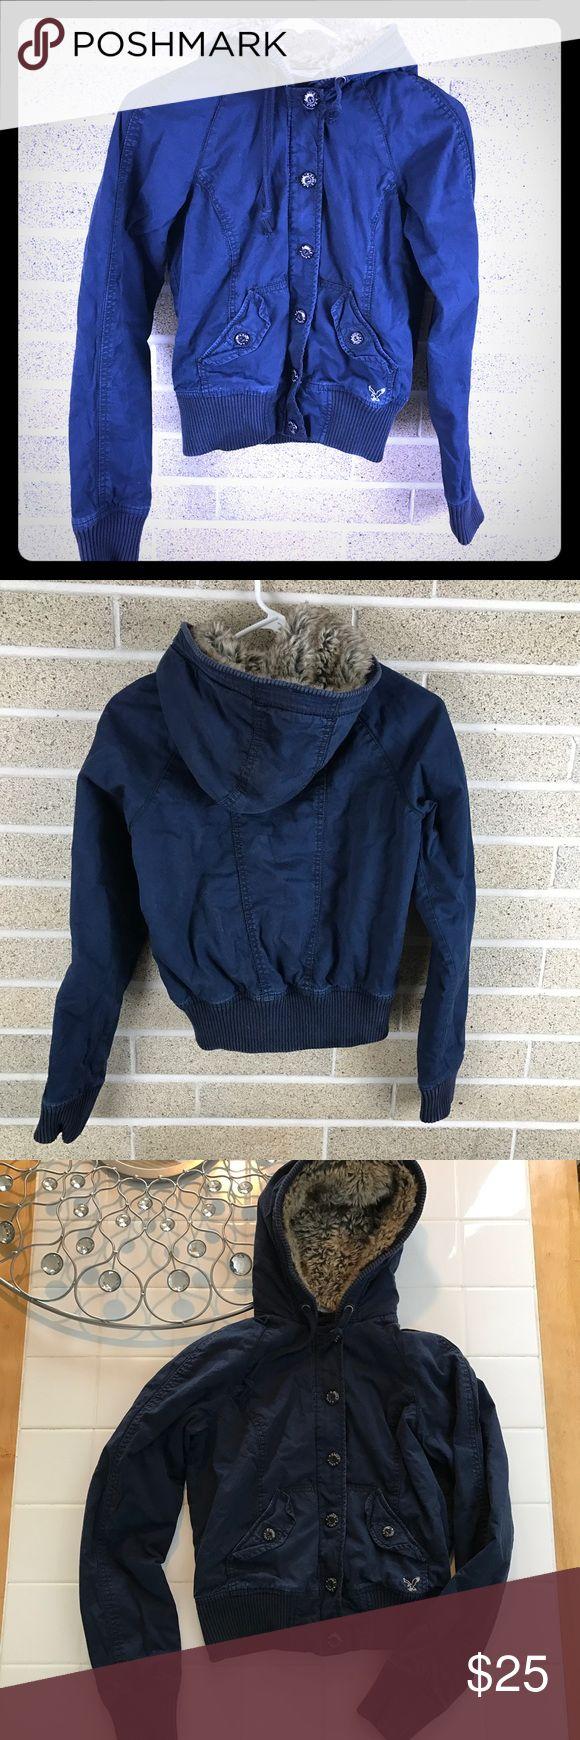 American Eagle XS fur hood crop coat AMERICAN EAGLE FAUX FUR HOODED JACKET Full Zipper Size XS Crop American Eagle Outfitters Jackets & Coats